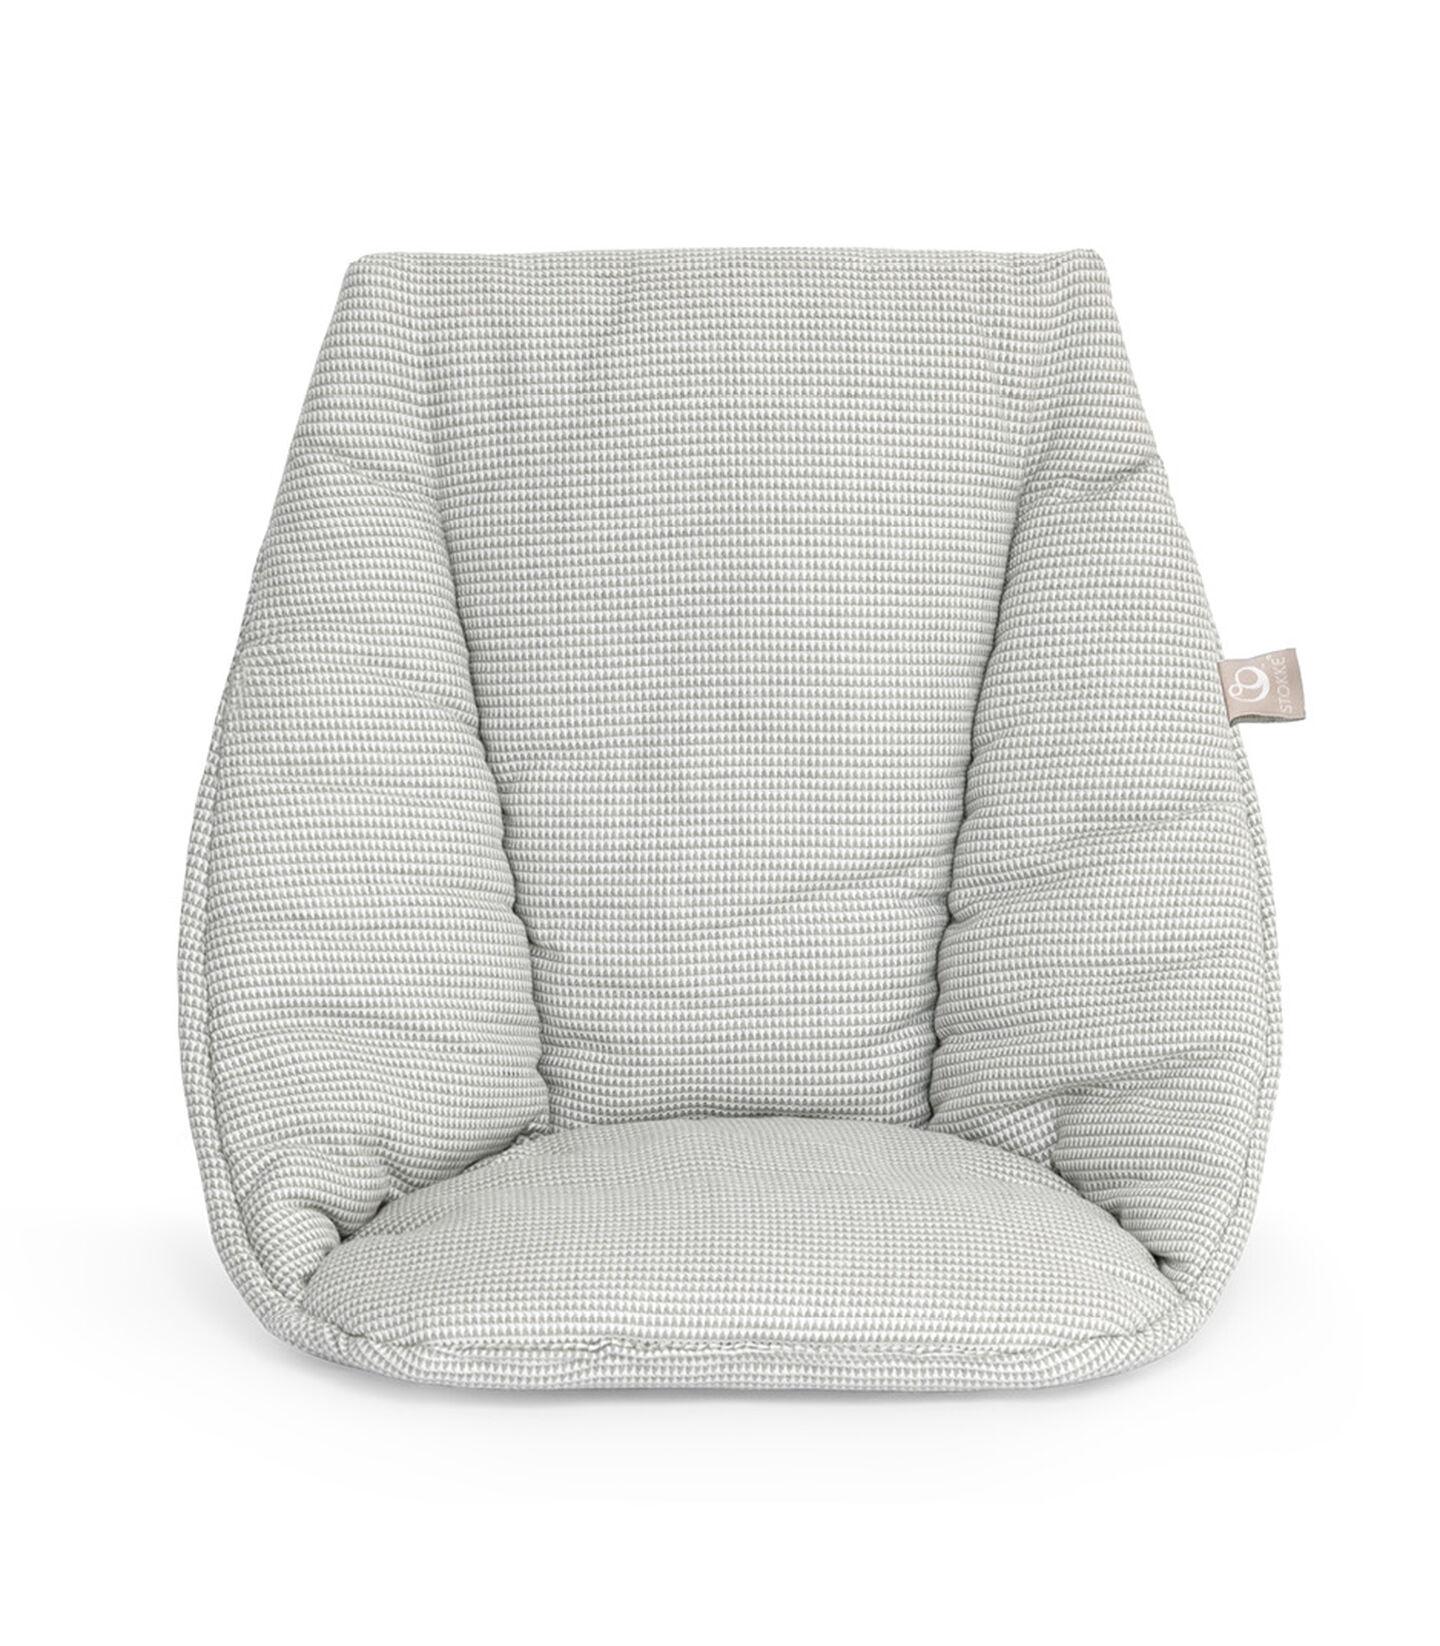 Tripp Trapp® babykudde Nordic Grey, Nordic Grey, mainview view 2